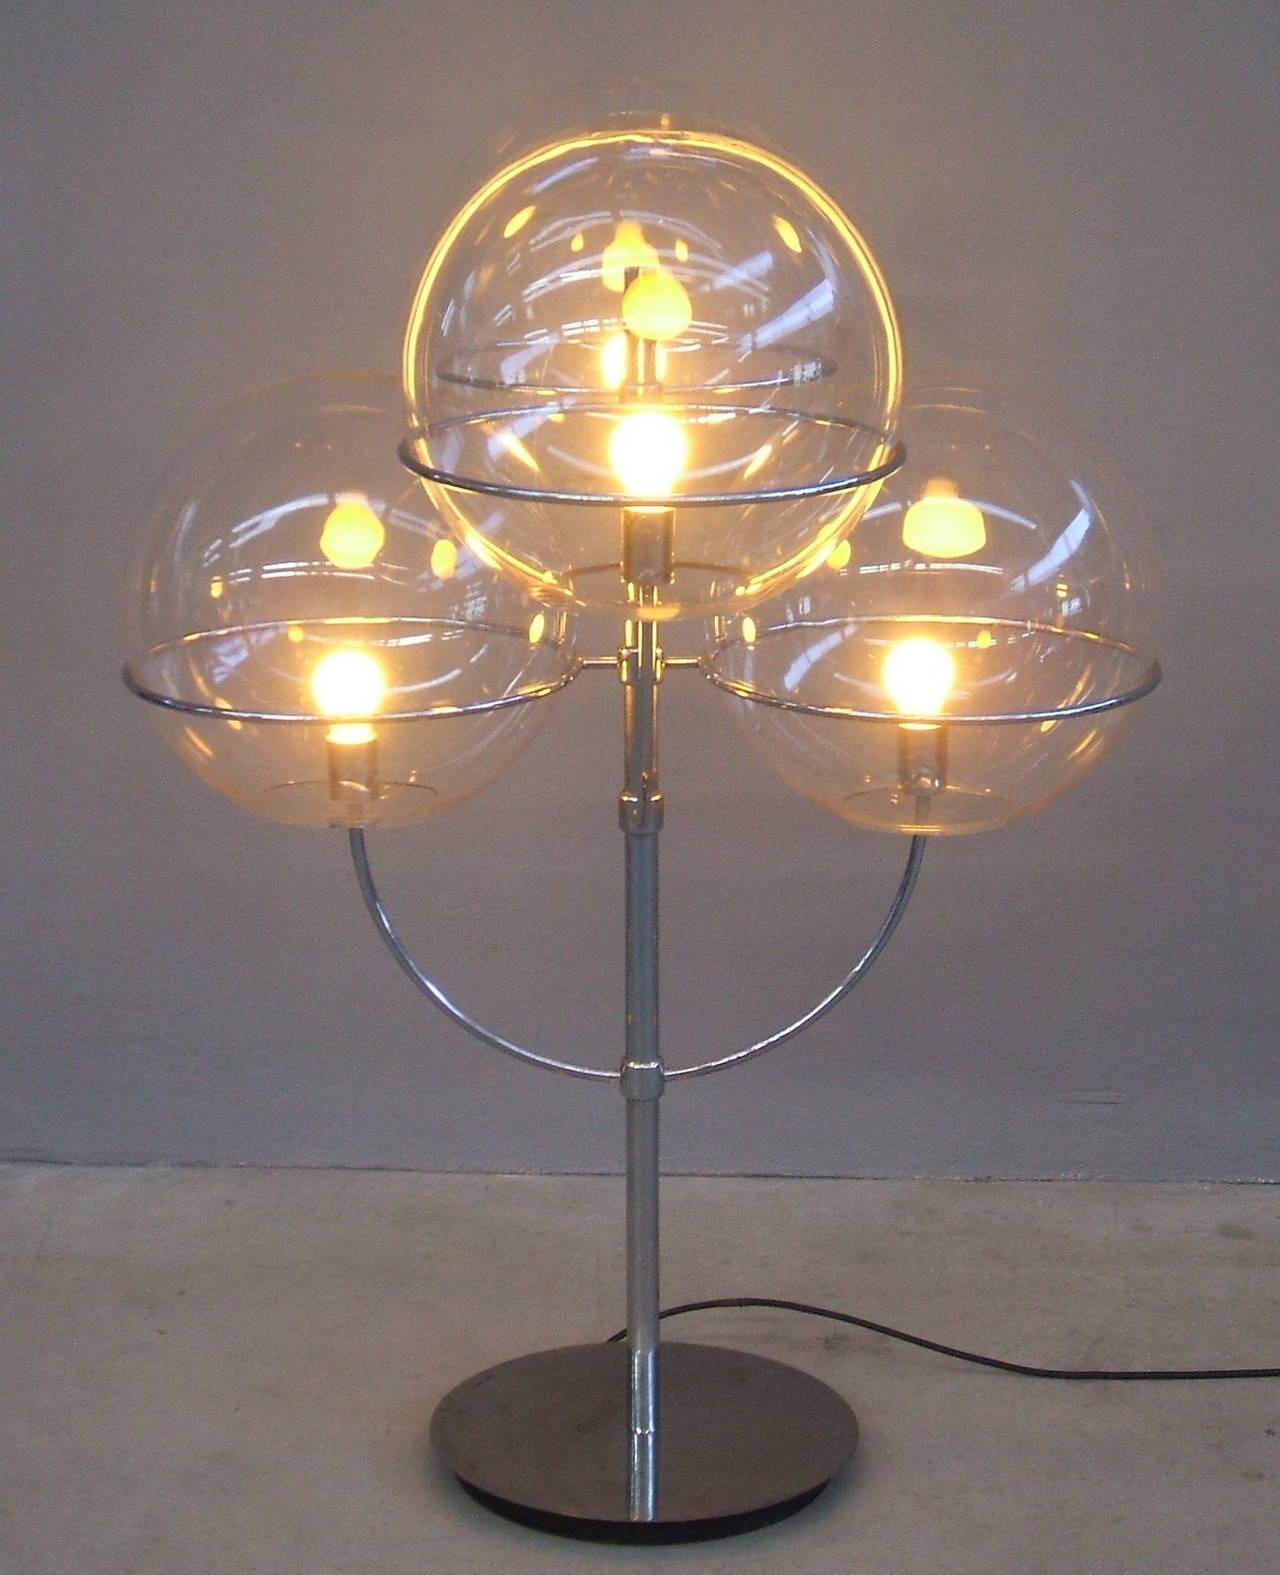 Lyndon De Sol Floor Lamp by Vico Magistretti In Excellent Condition For Sale In Carpaneto Piacentino, Italy